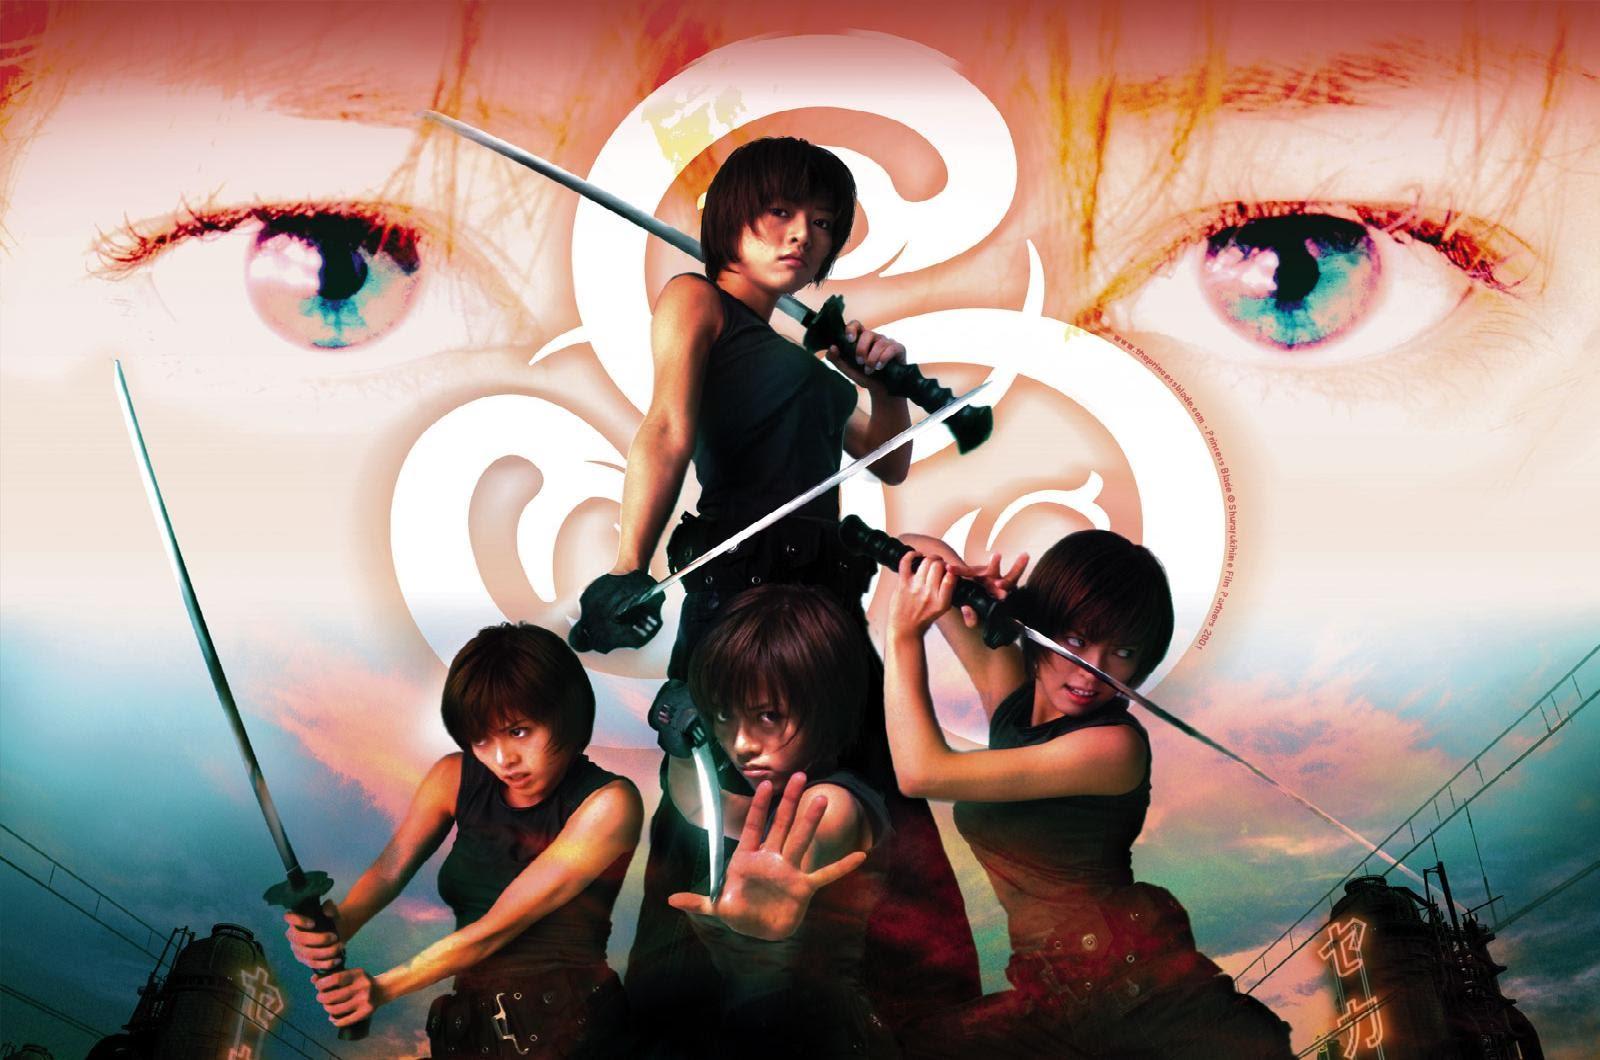 The Princess Blade